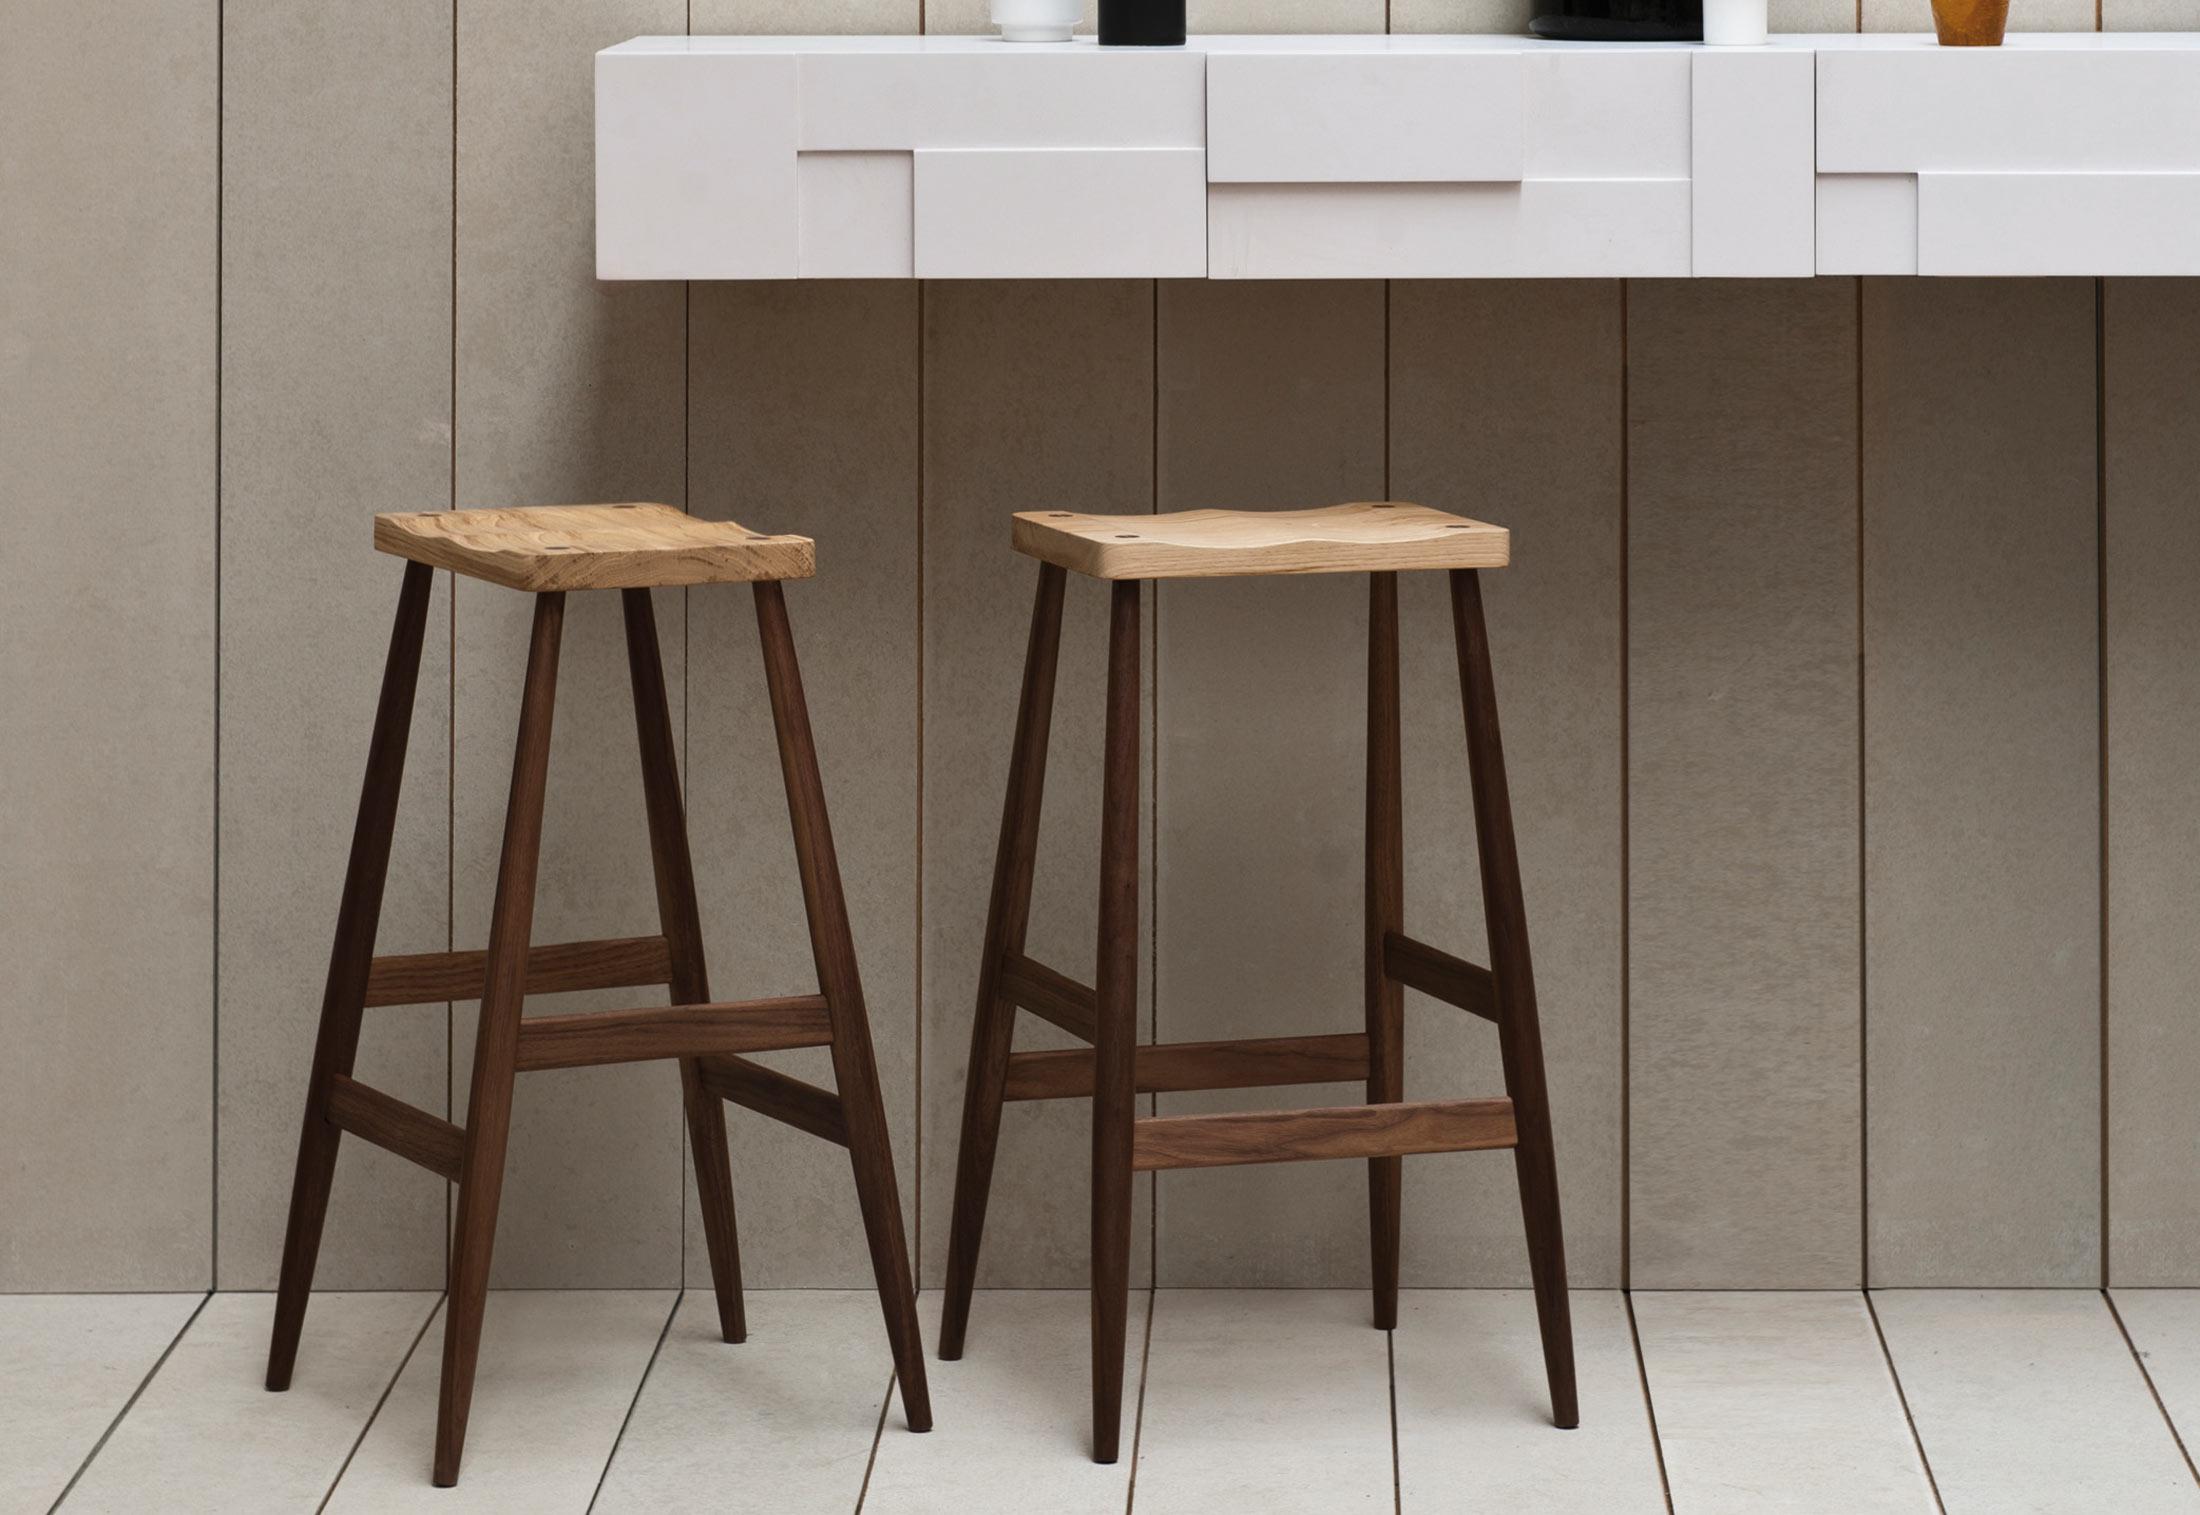 Marvelous Imo Bar Stool By Pinch Stylepark Uwap Interior Chair Design Uwaporg